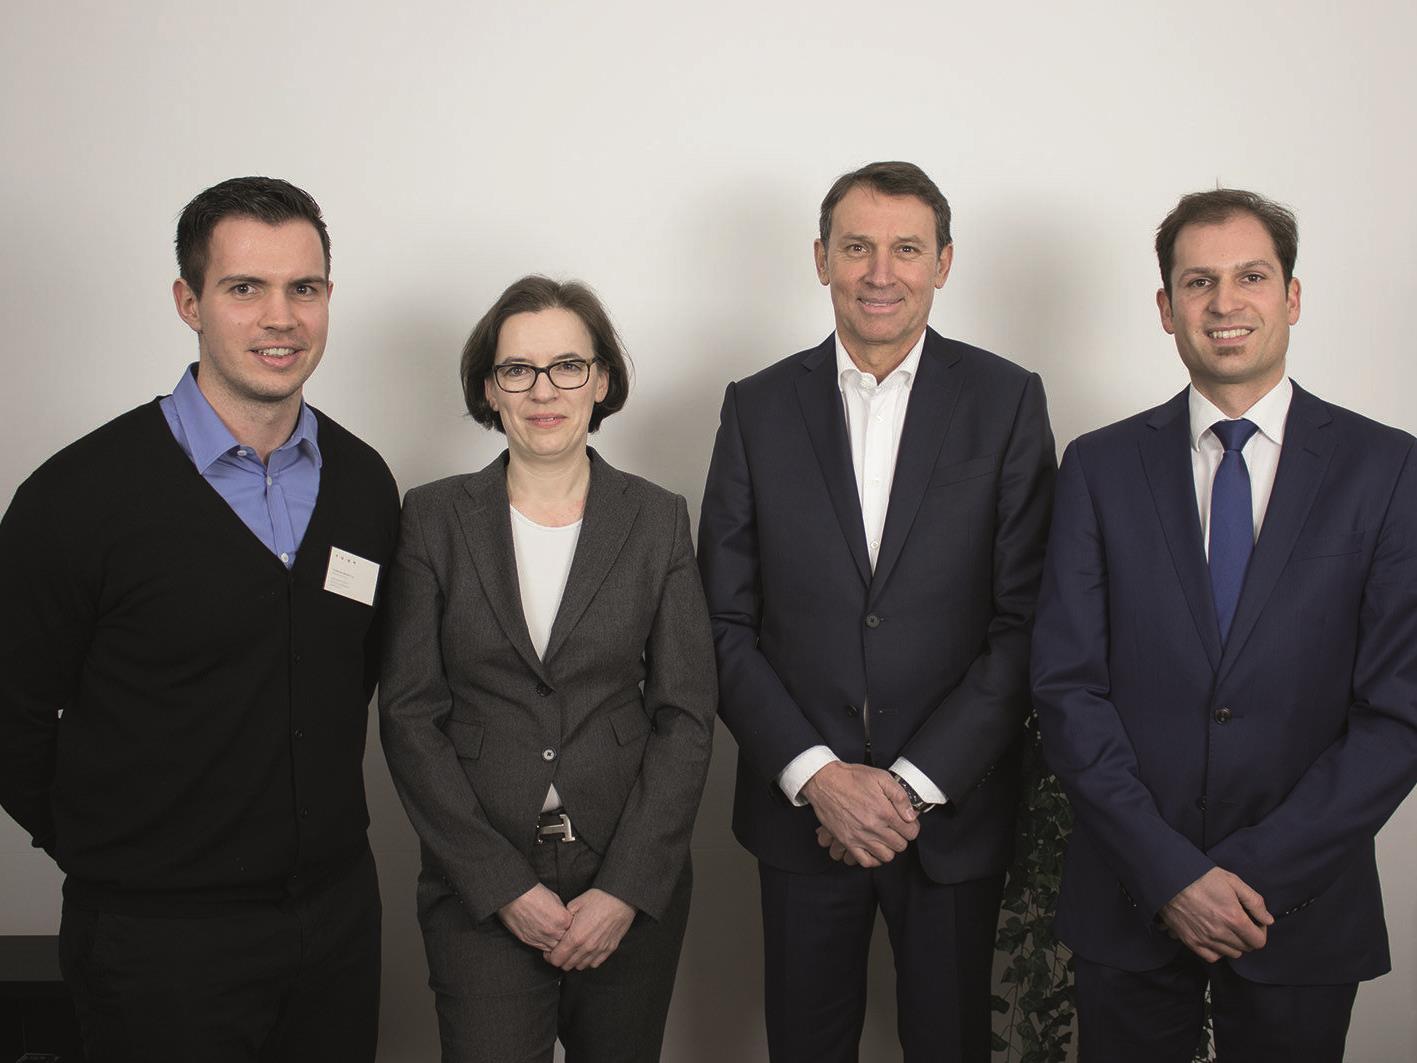 v.l.n.r.: Florian Wassel (TOWA), Ursula Koners (Zeppelin Universität), Werner Deuring (WD Beteiligung) und Reinhard Prügl (Zeppelin Universität)